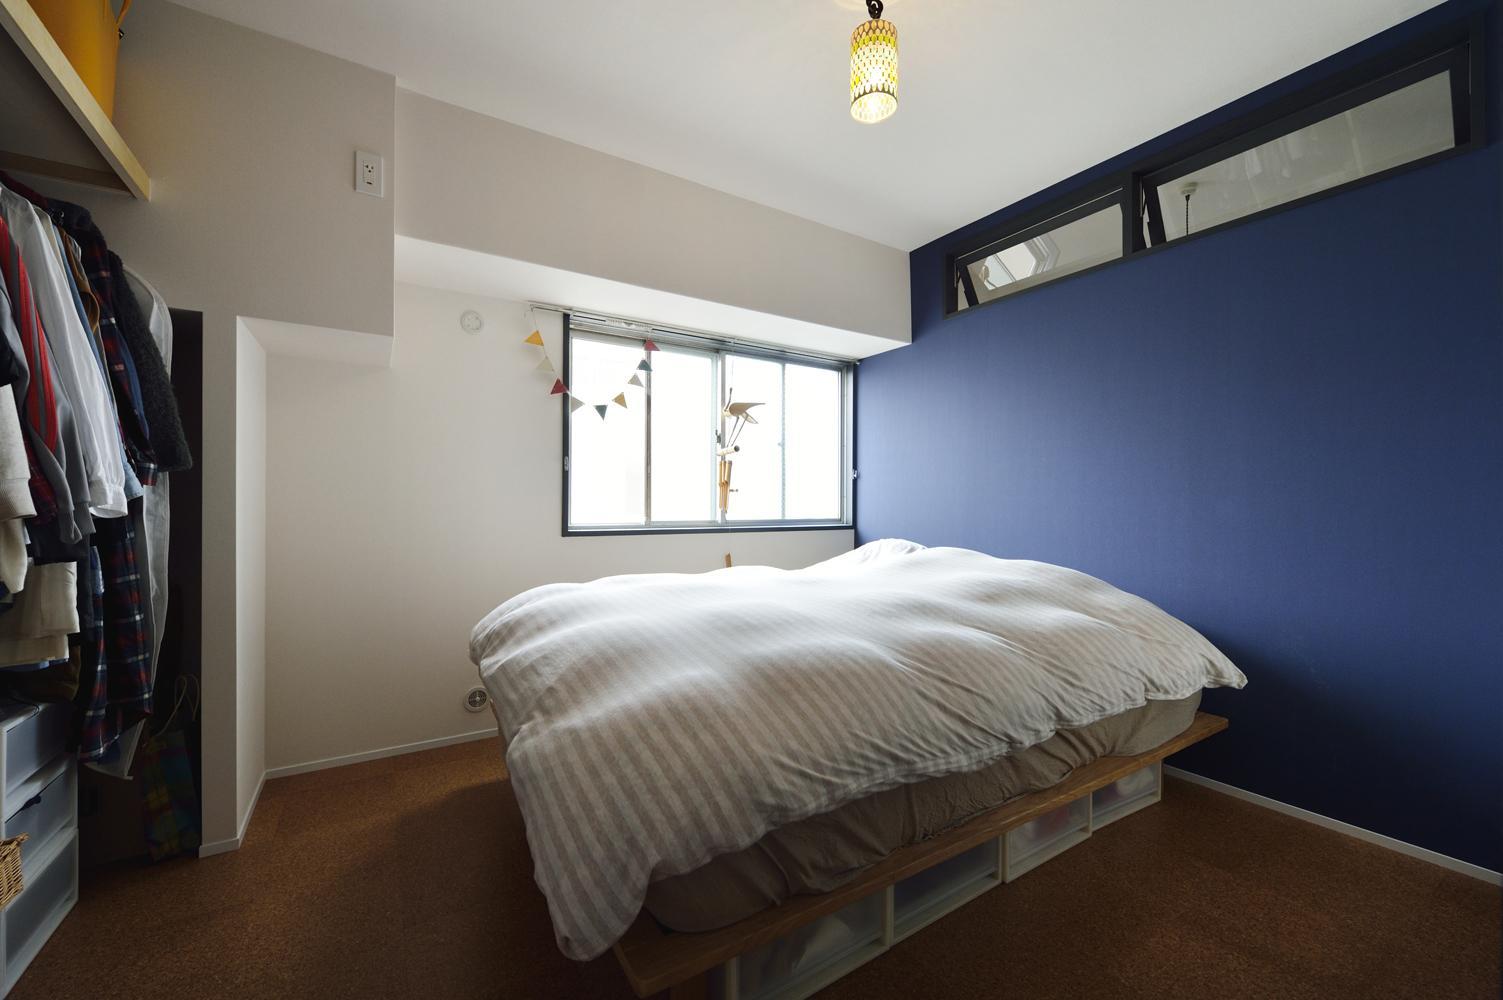 K邸・ビンテージマンションを自分色にの部屋 濃いブルーのアクセントクロスの寝室